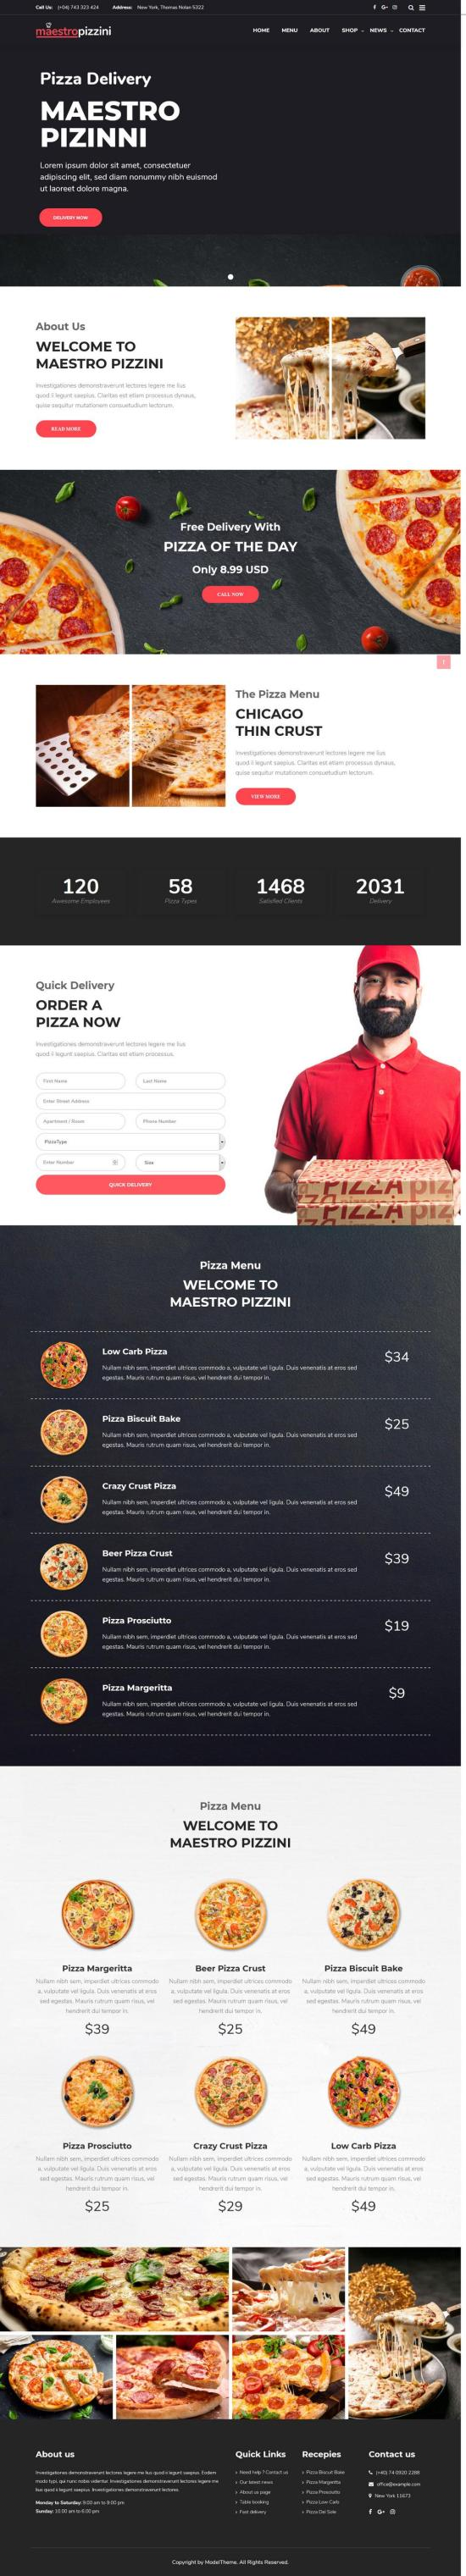 MaestroPizzini Restaurant WordPress Theme